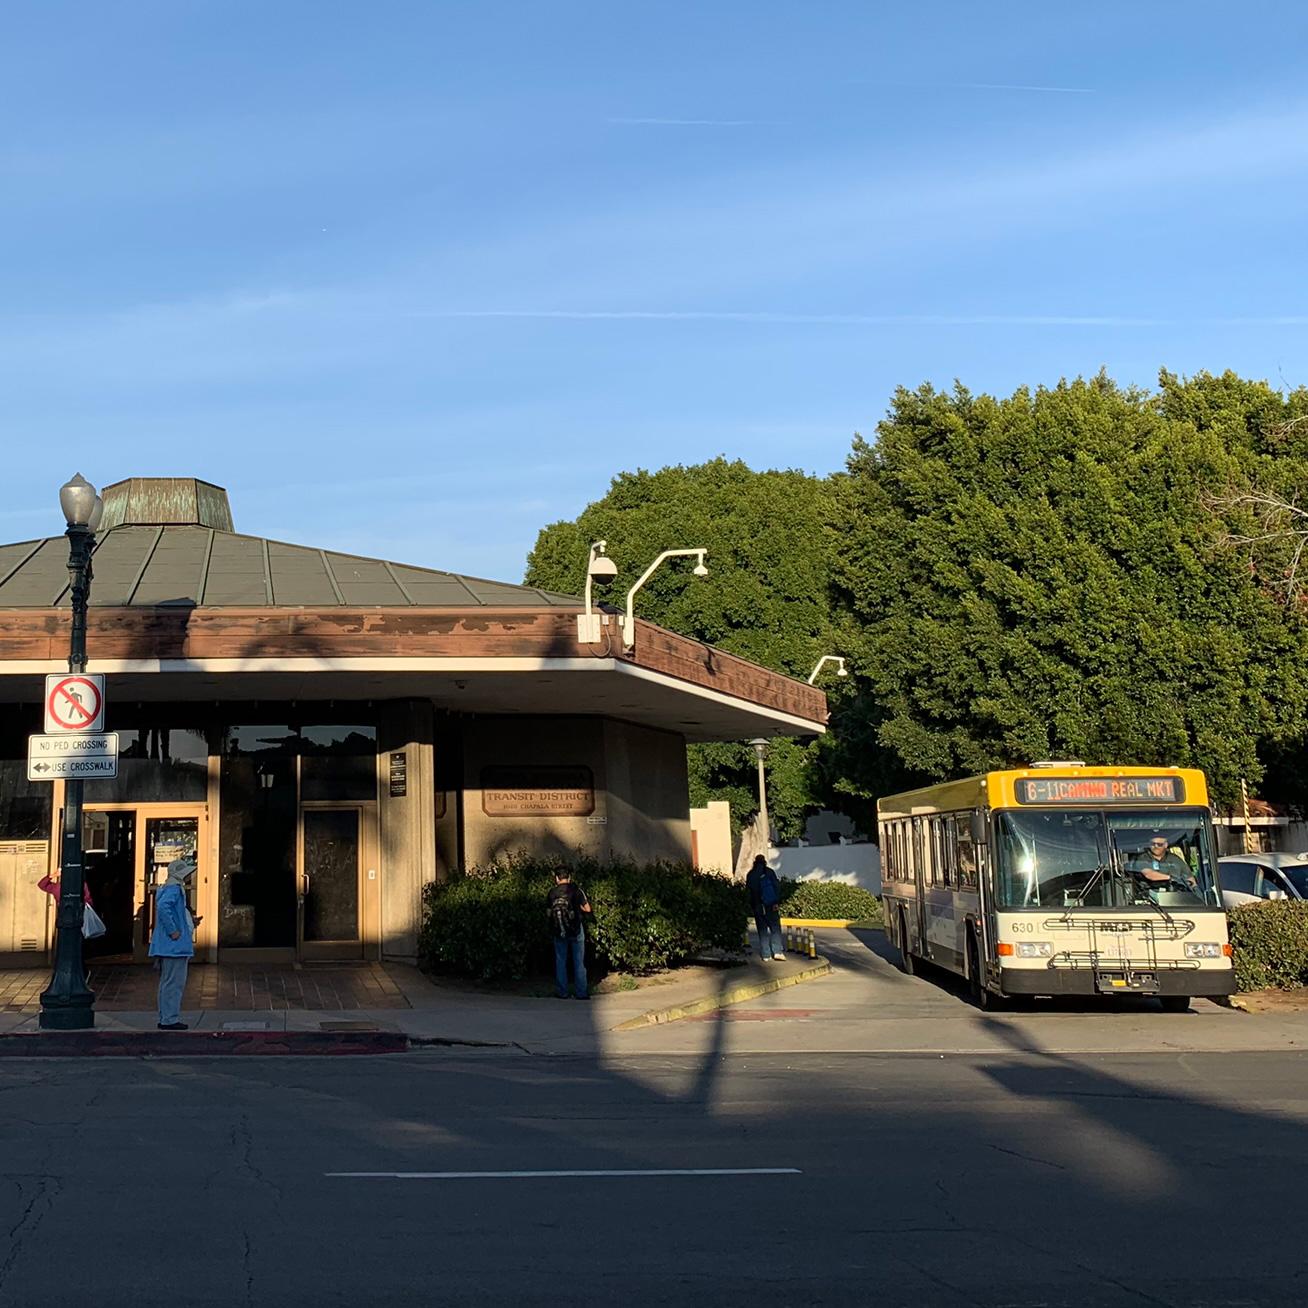 mtd-bus-station-05.jpg